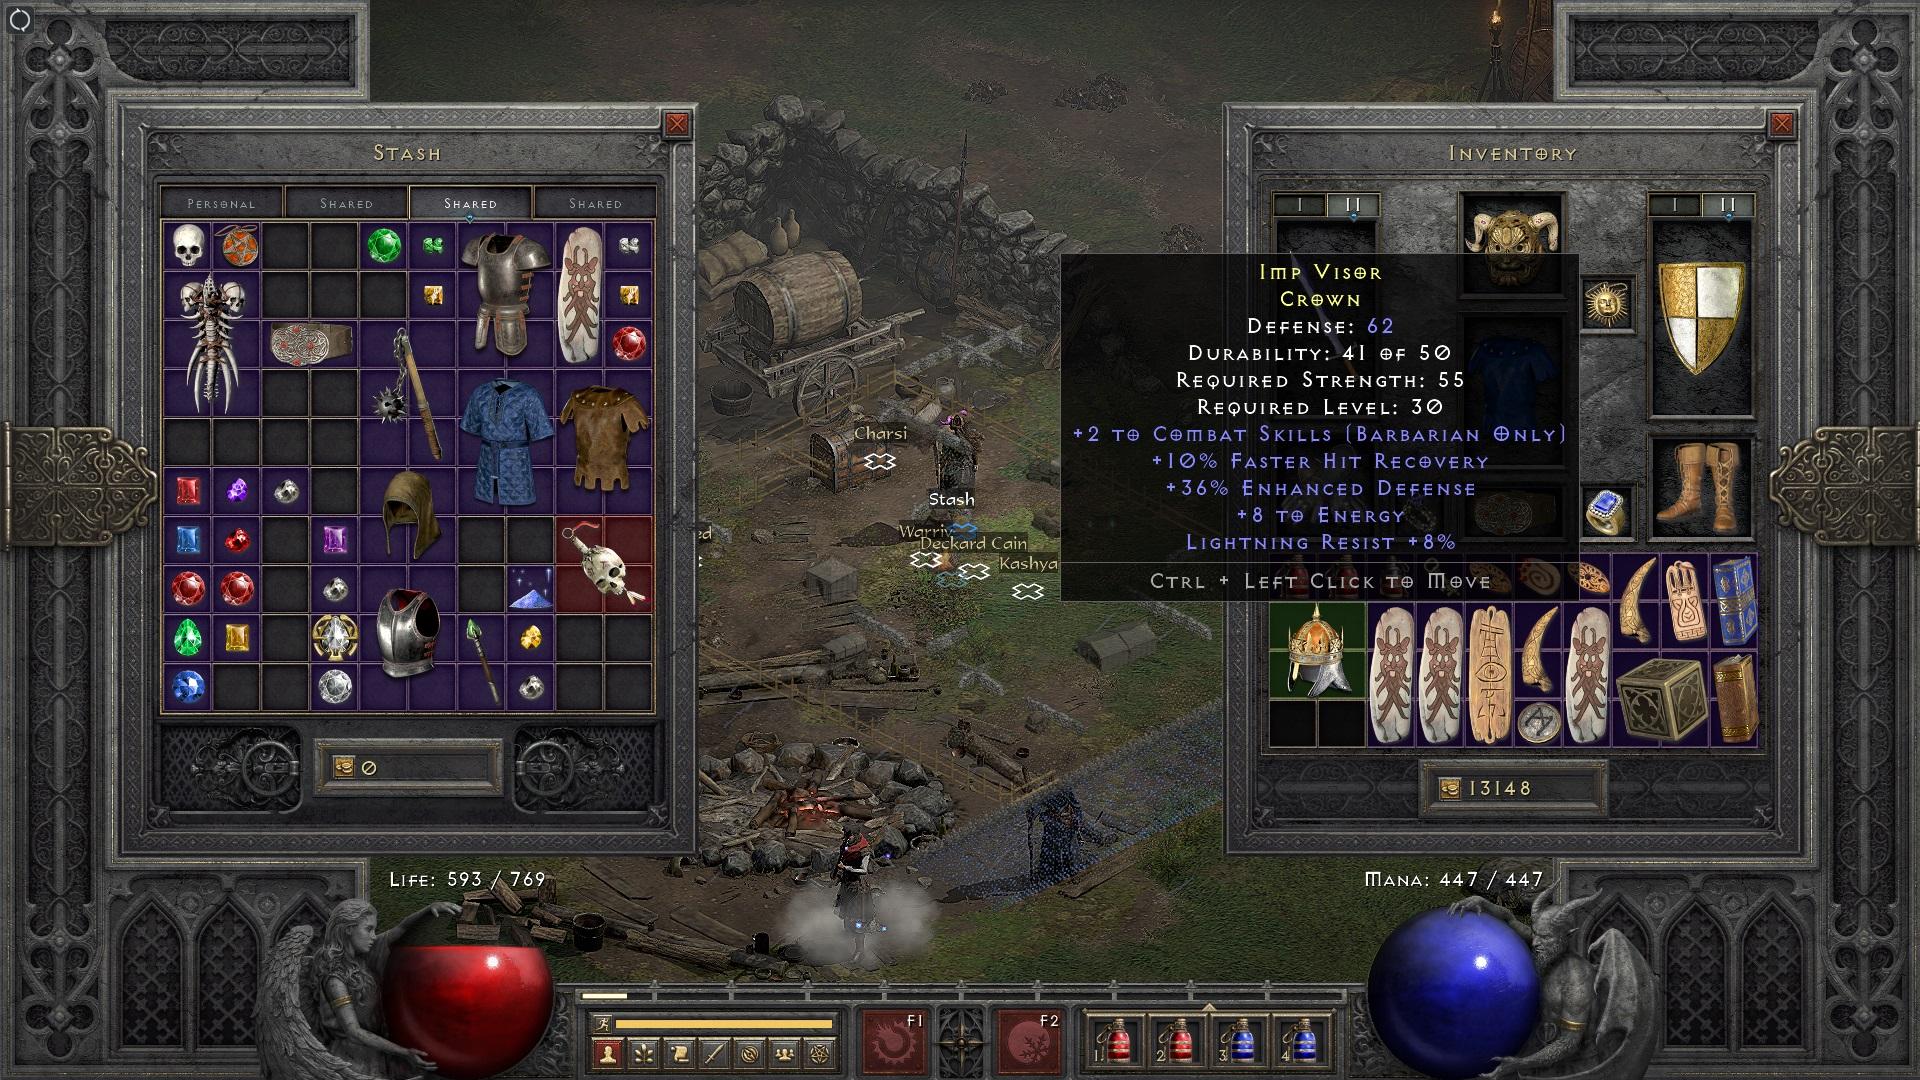 Imp Visor + 2 barbarian skill